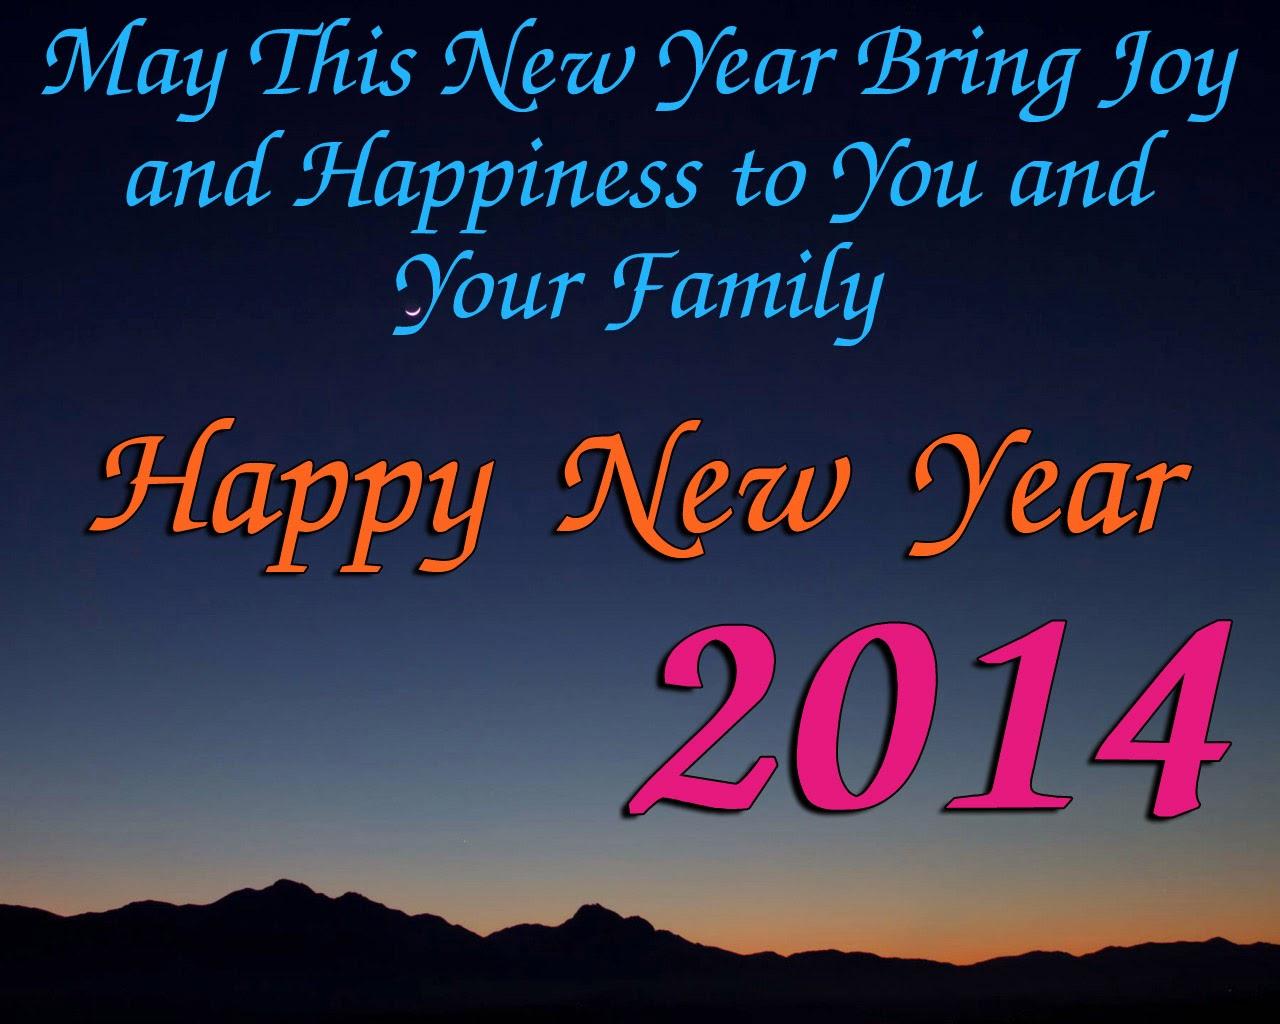 Happy New Year 2014 Wallpapers - Christianhome11|Verses|Geet Zaboor ...